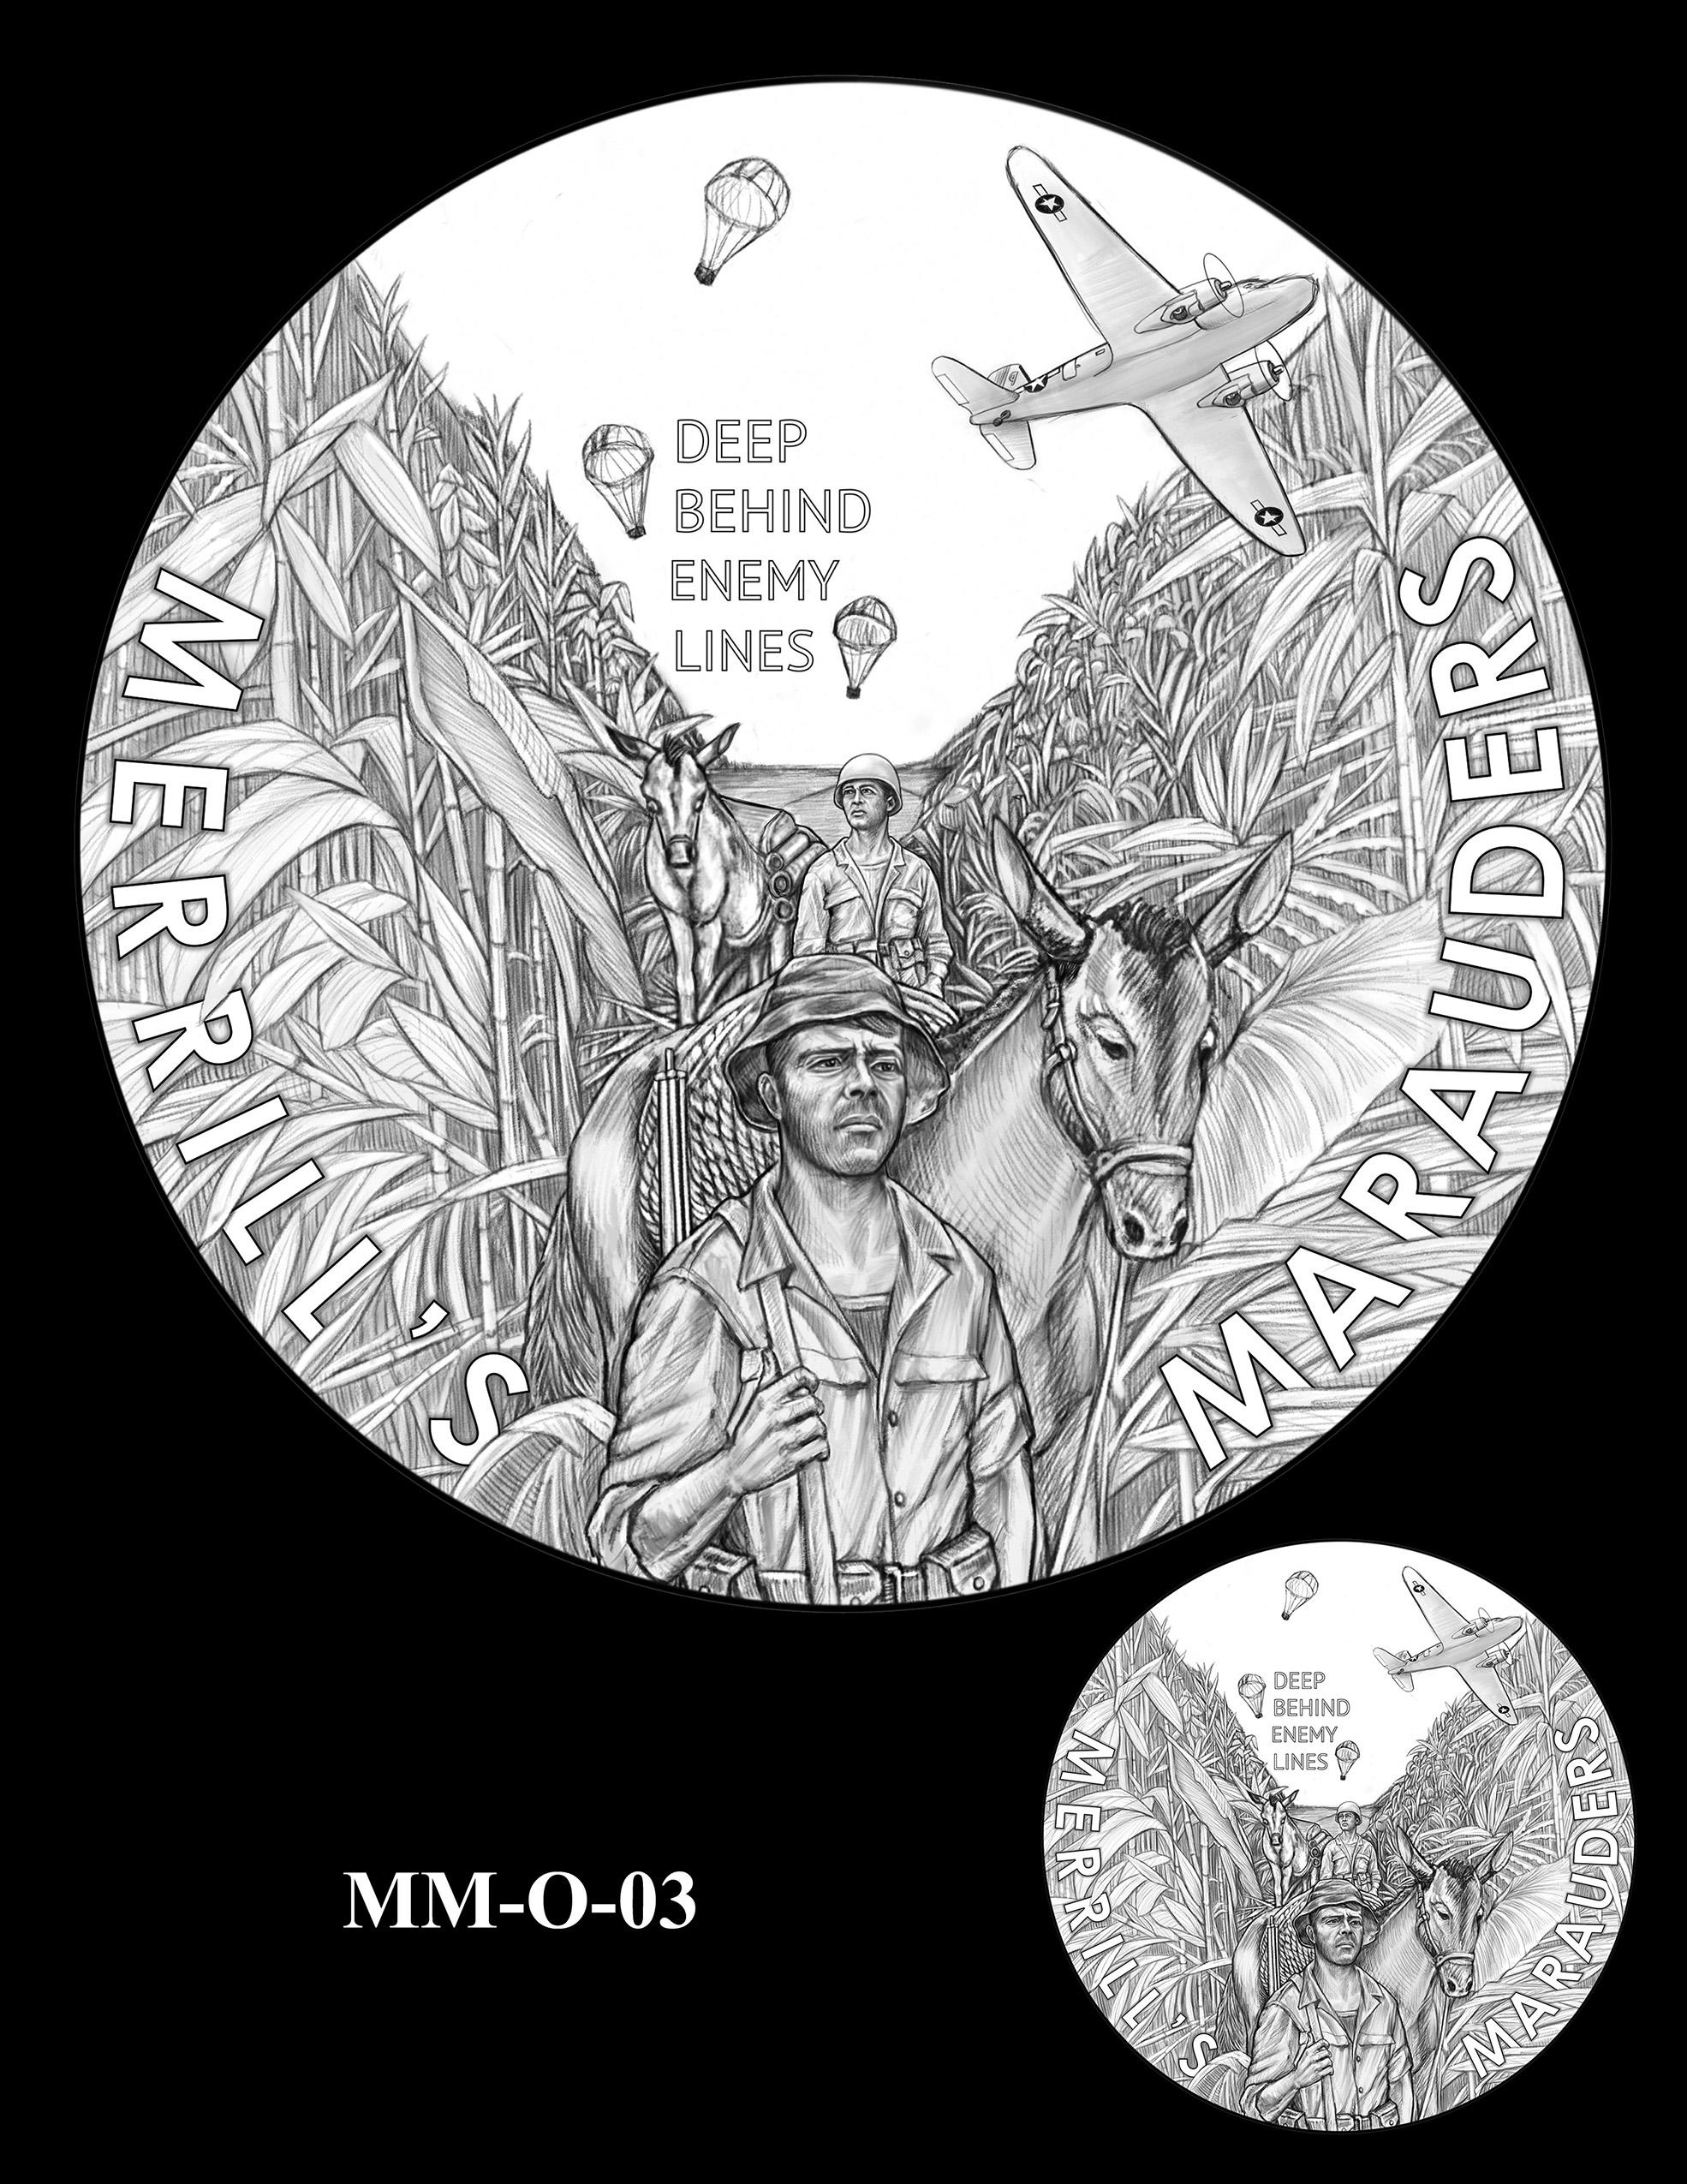 MM-O-03 -- Merrill's Marauders Congressional Gold Medal